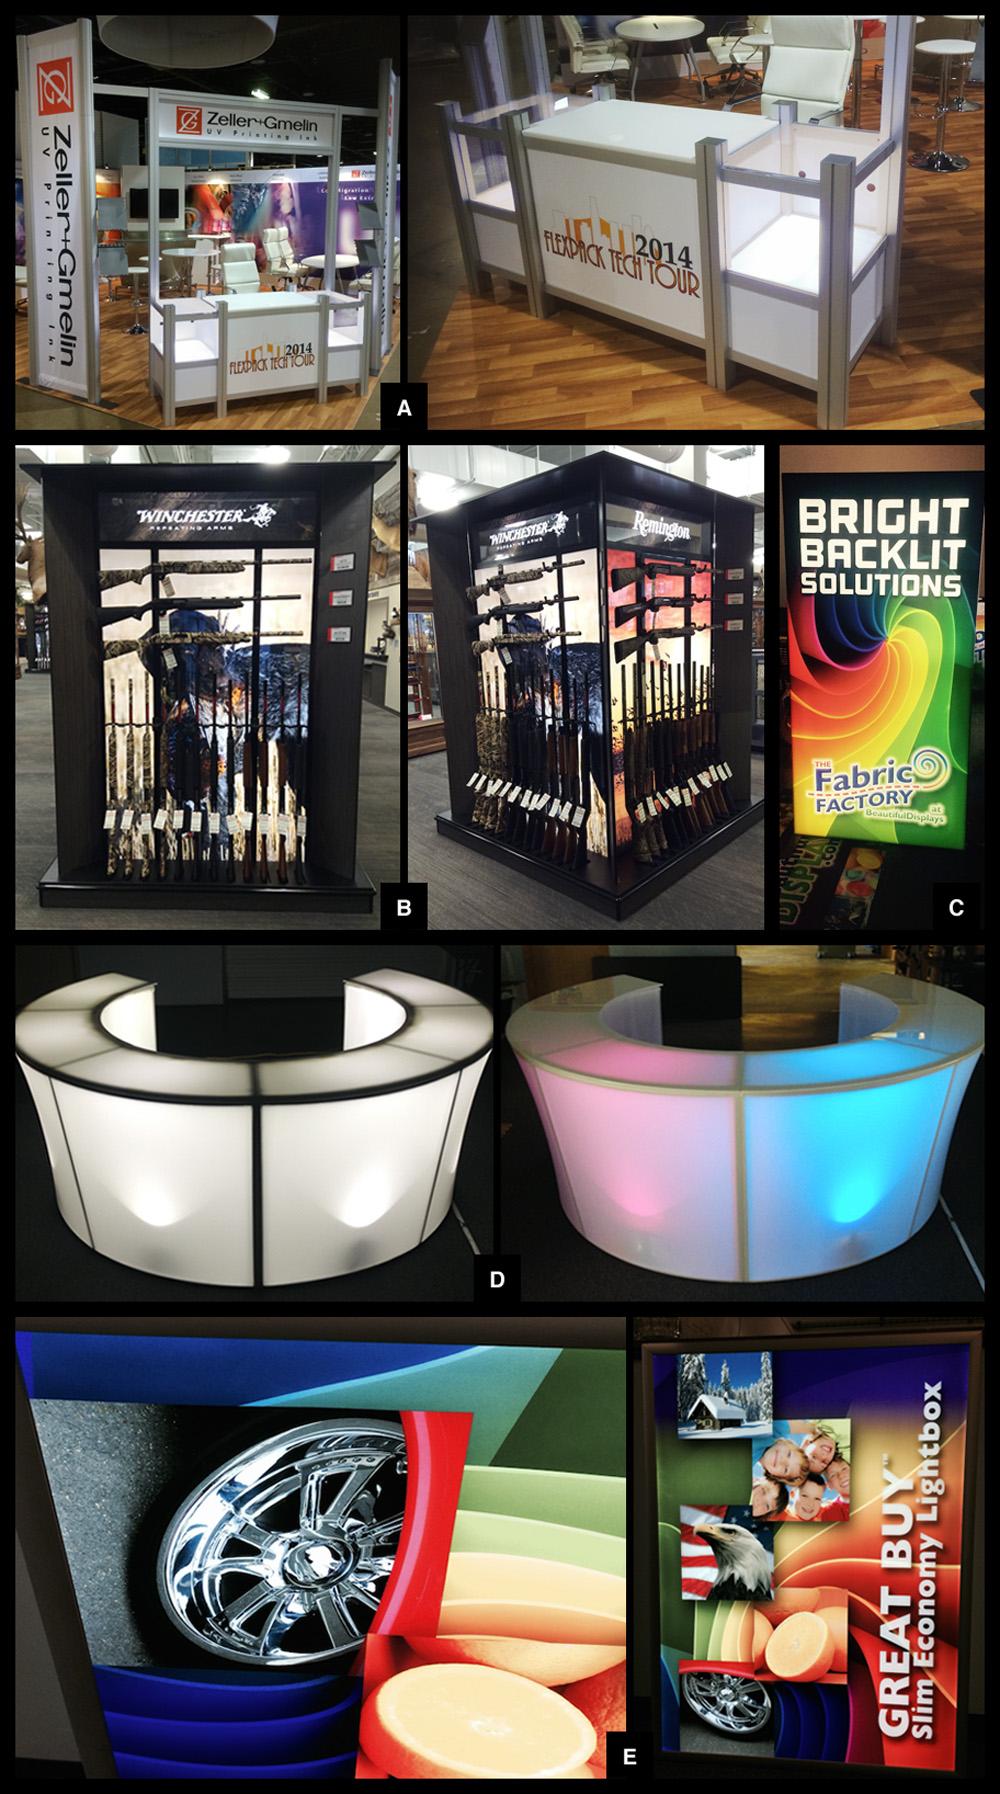 Backlit displays and graphics